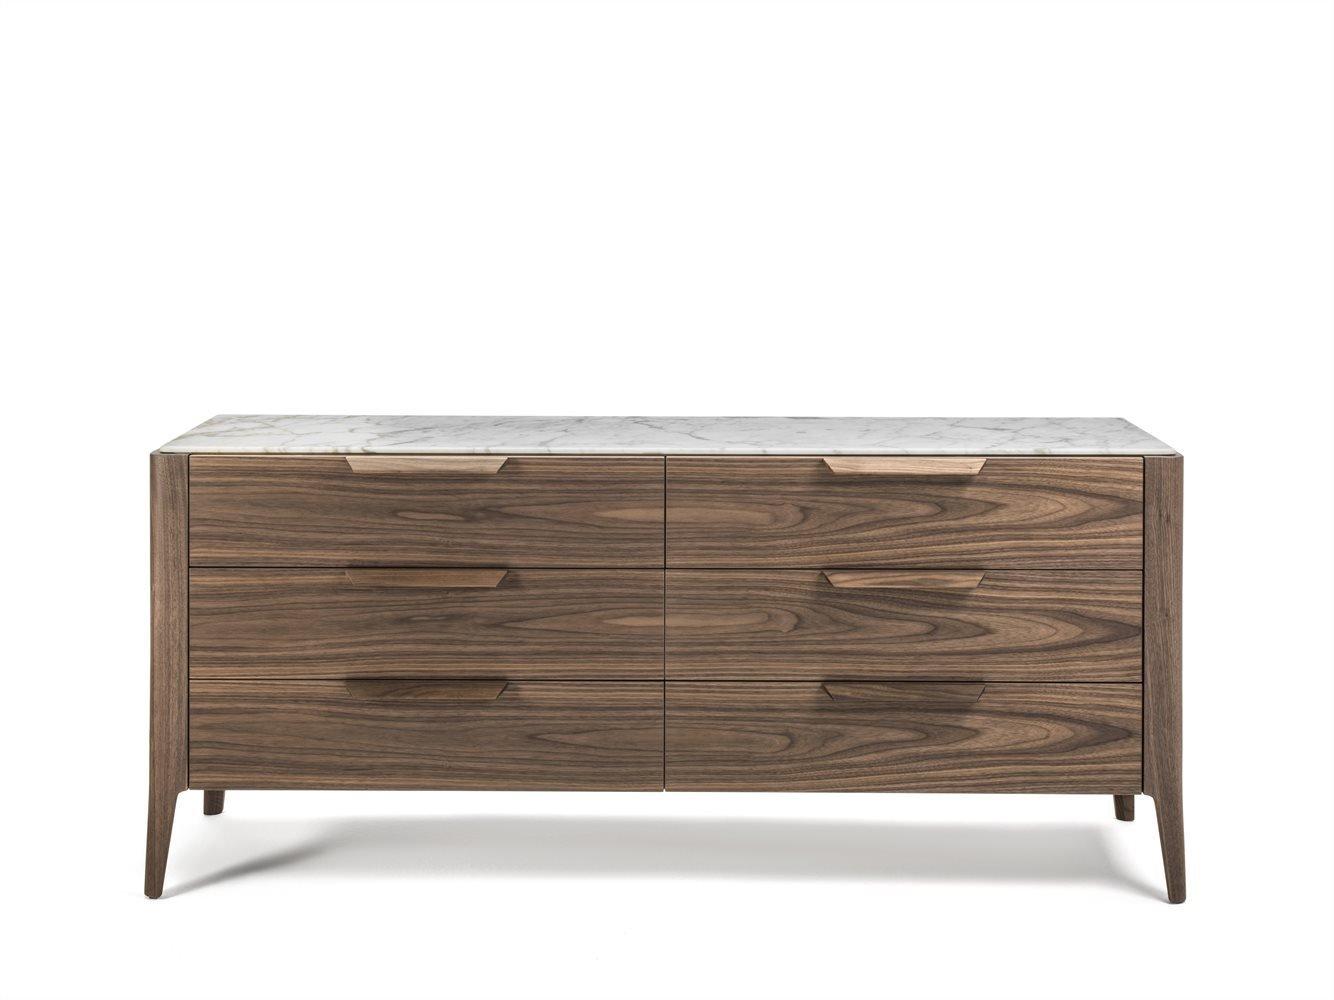 Ziggy Night 6 Chest Drawer cabinet from Porada, designed by C. Ballabio